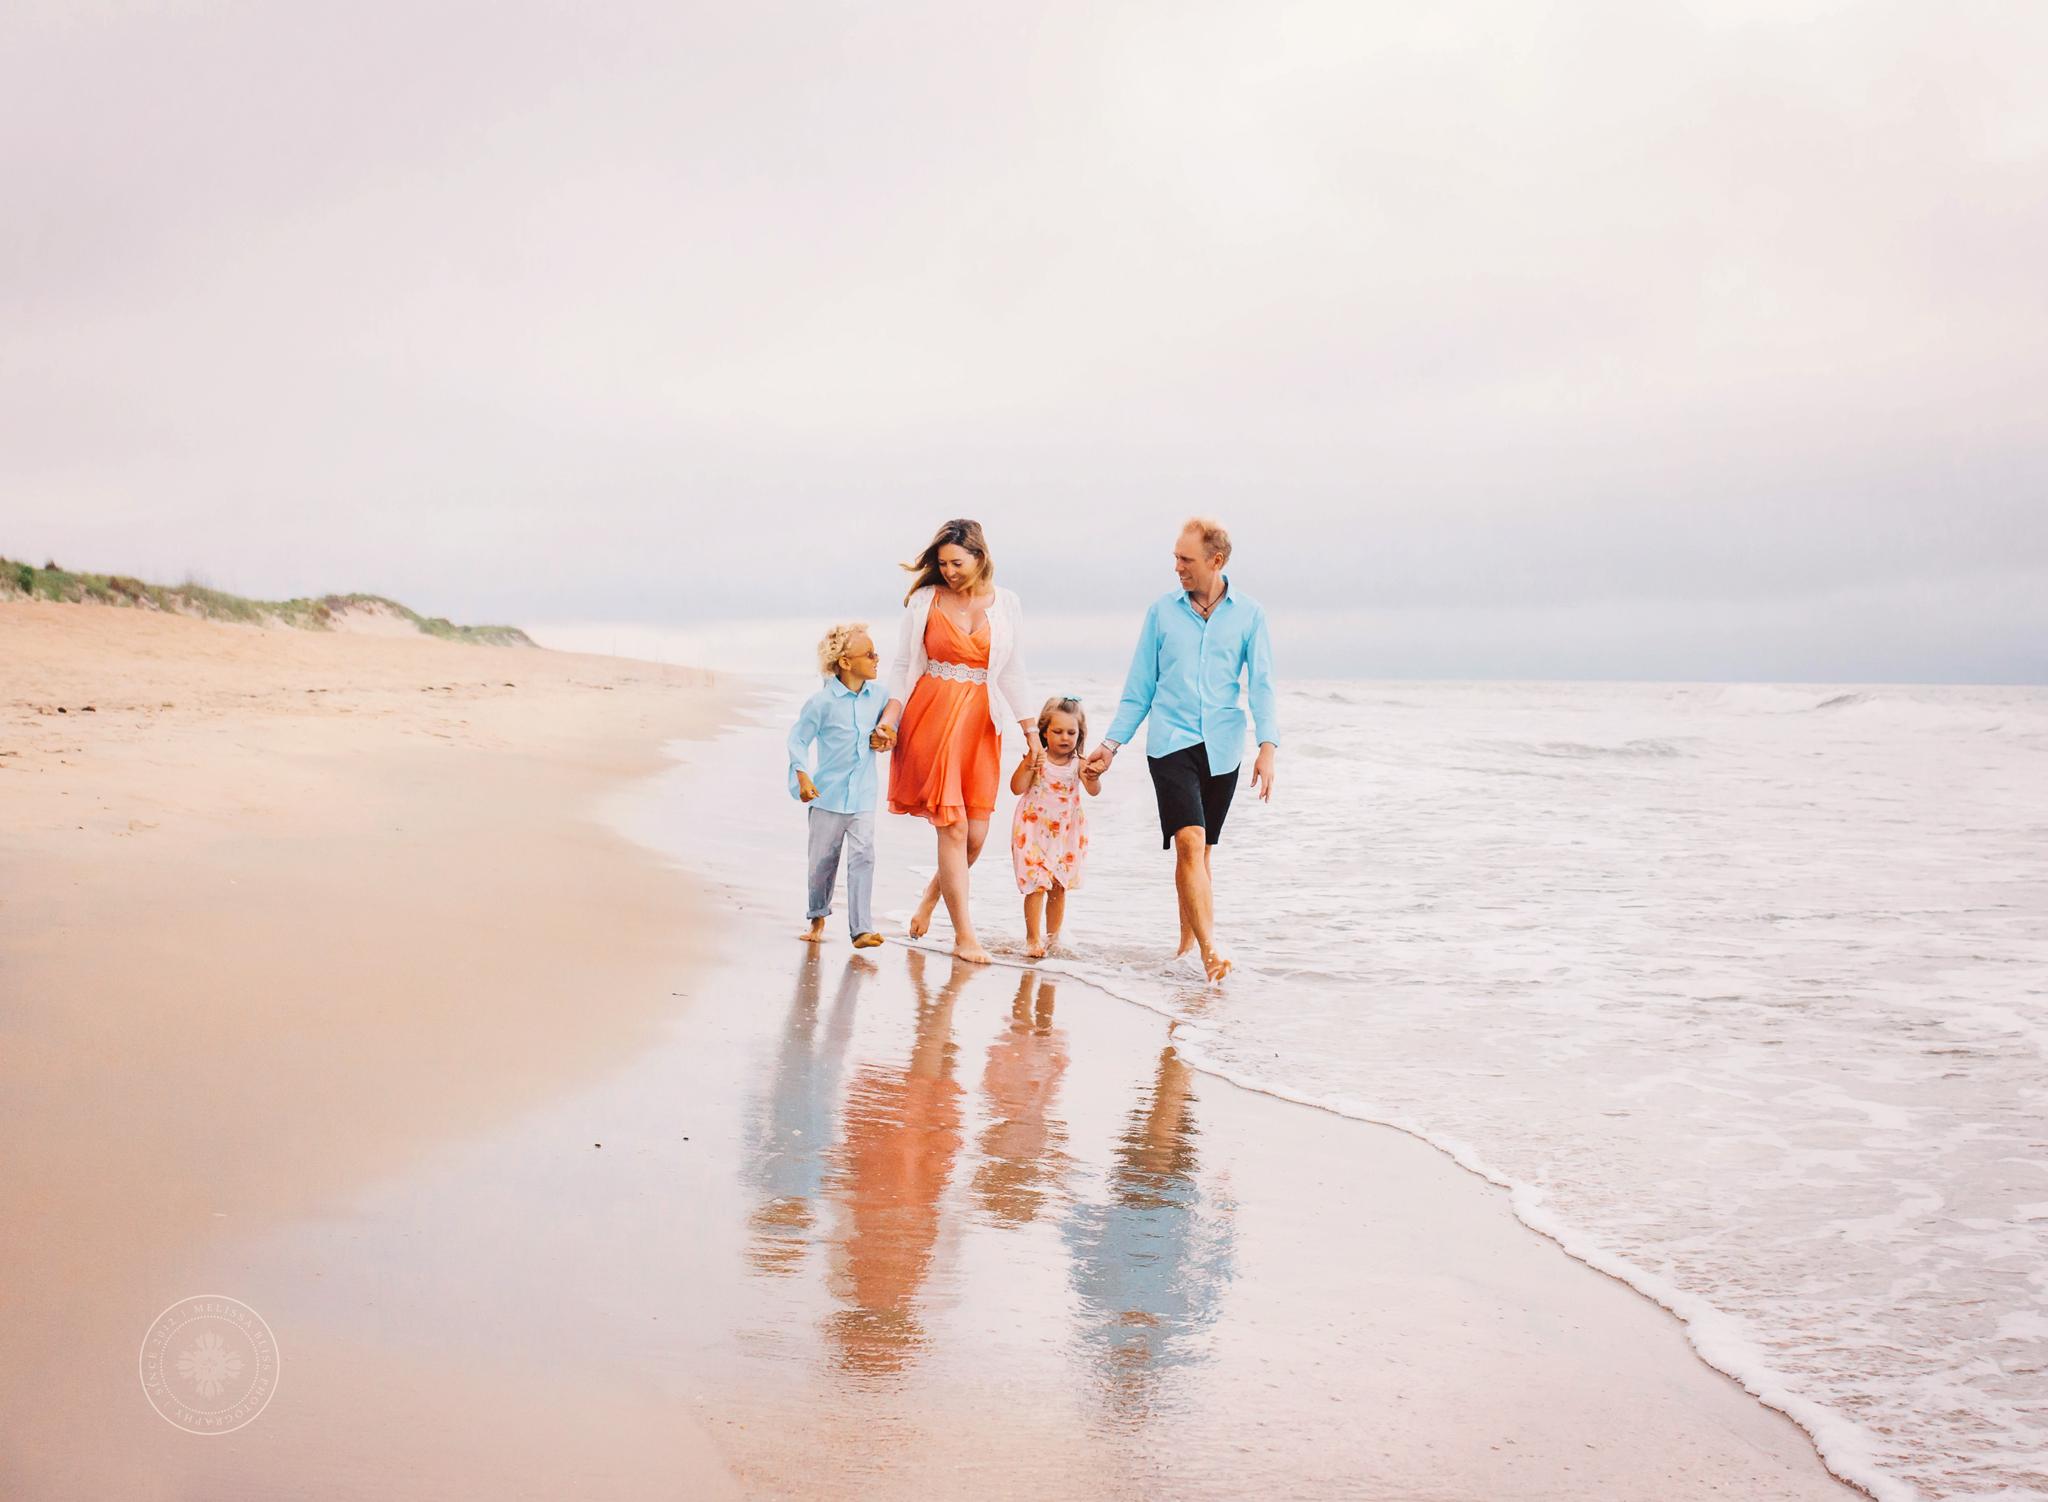 virginia-beach-photographers-family-beach-session-melissa-bliss-photography-hampton-roads14.jpg